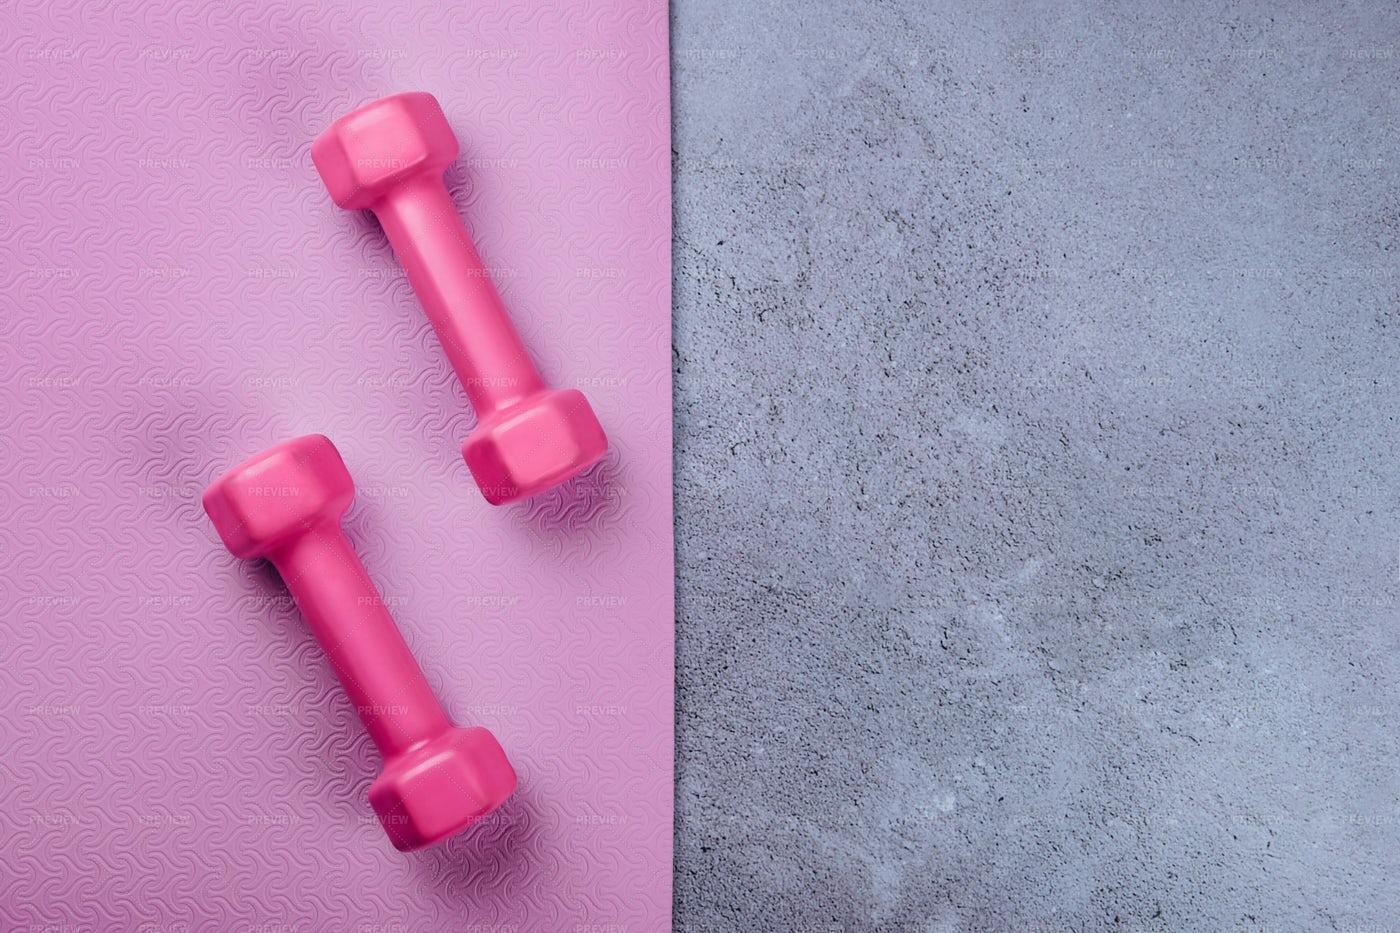 Sport Mat And Pink Dumbbells: Stock Photos